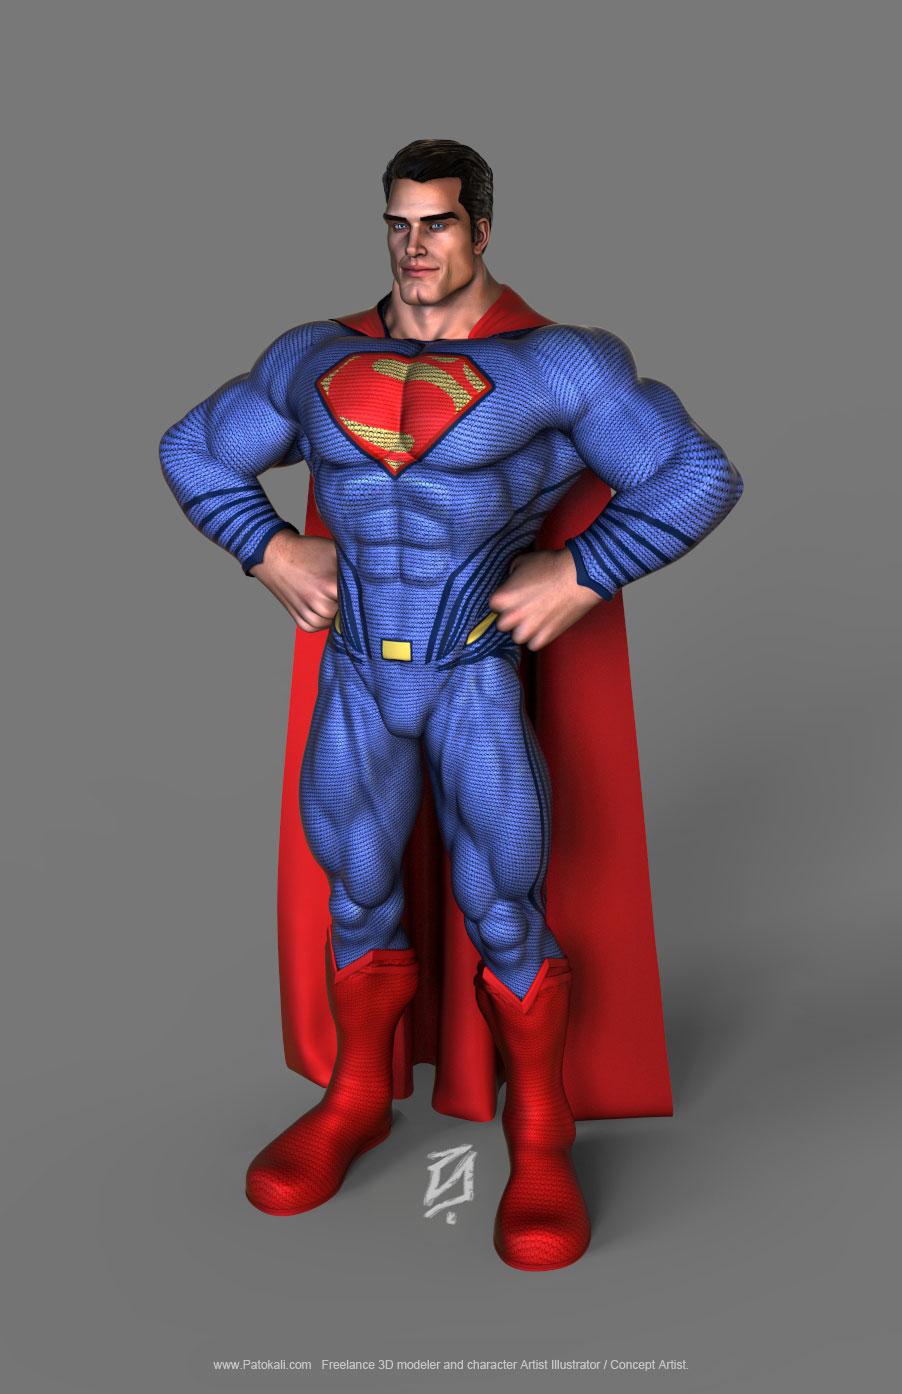 Supertman-Toon-KS2 by patokali